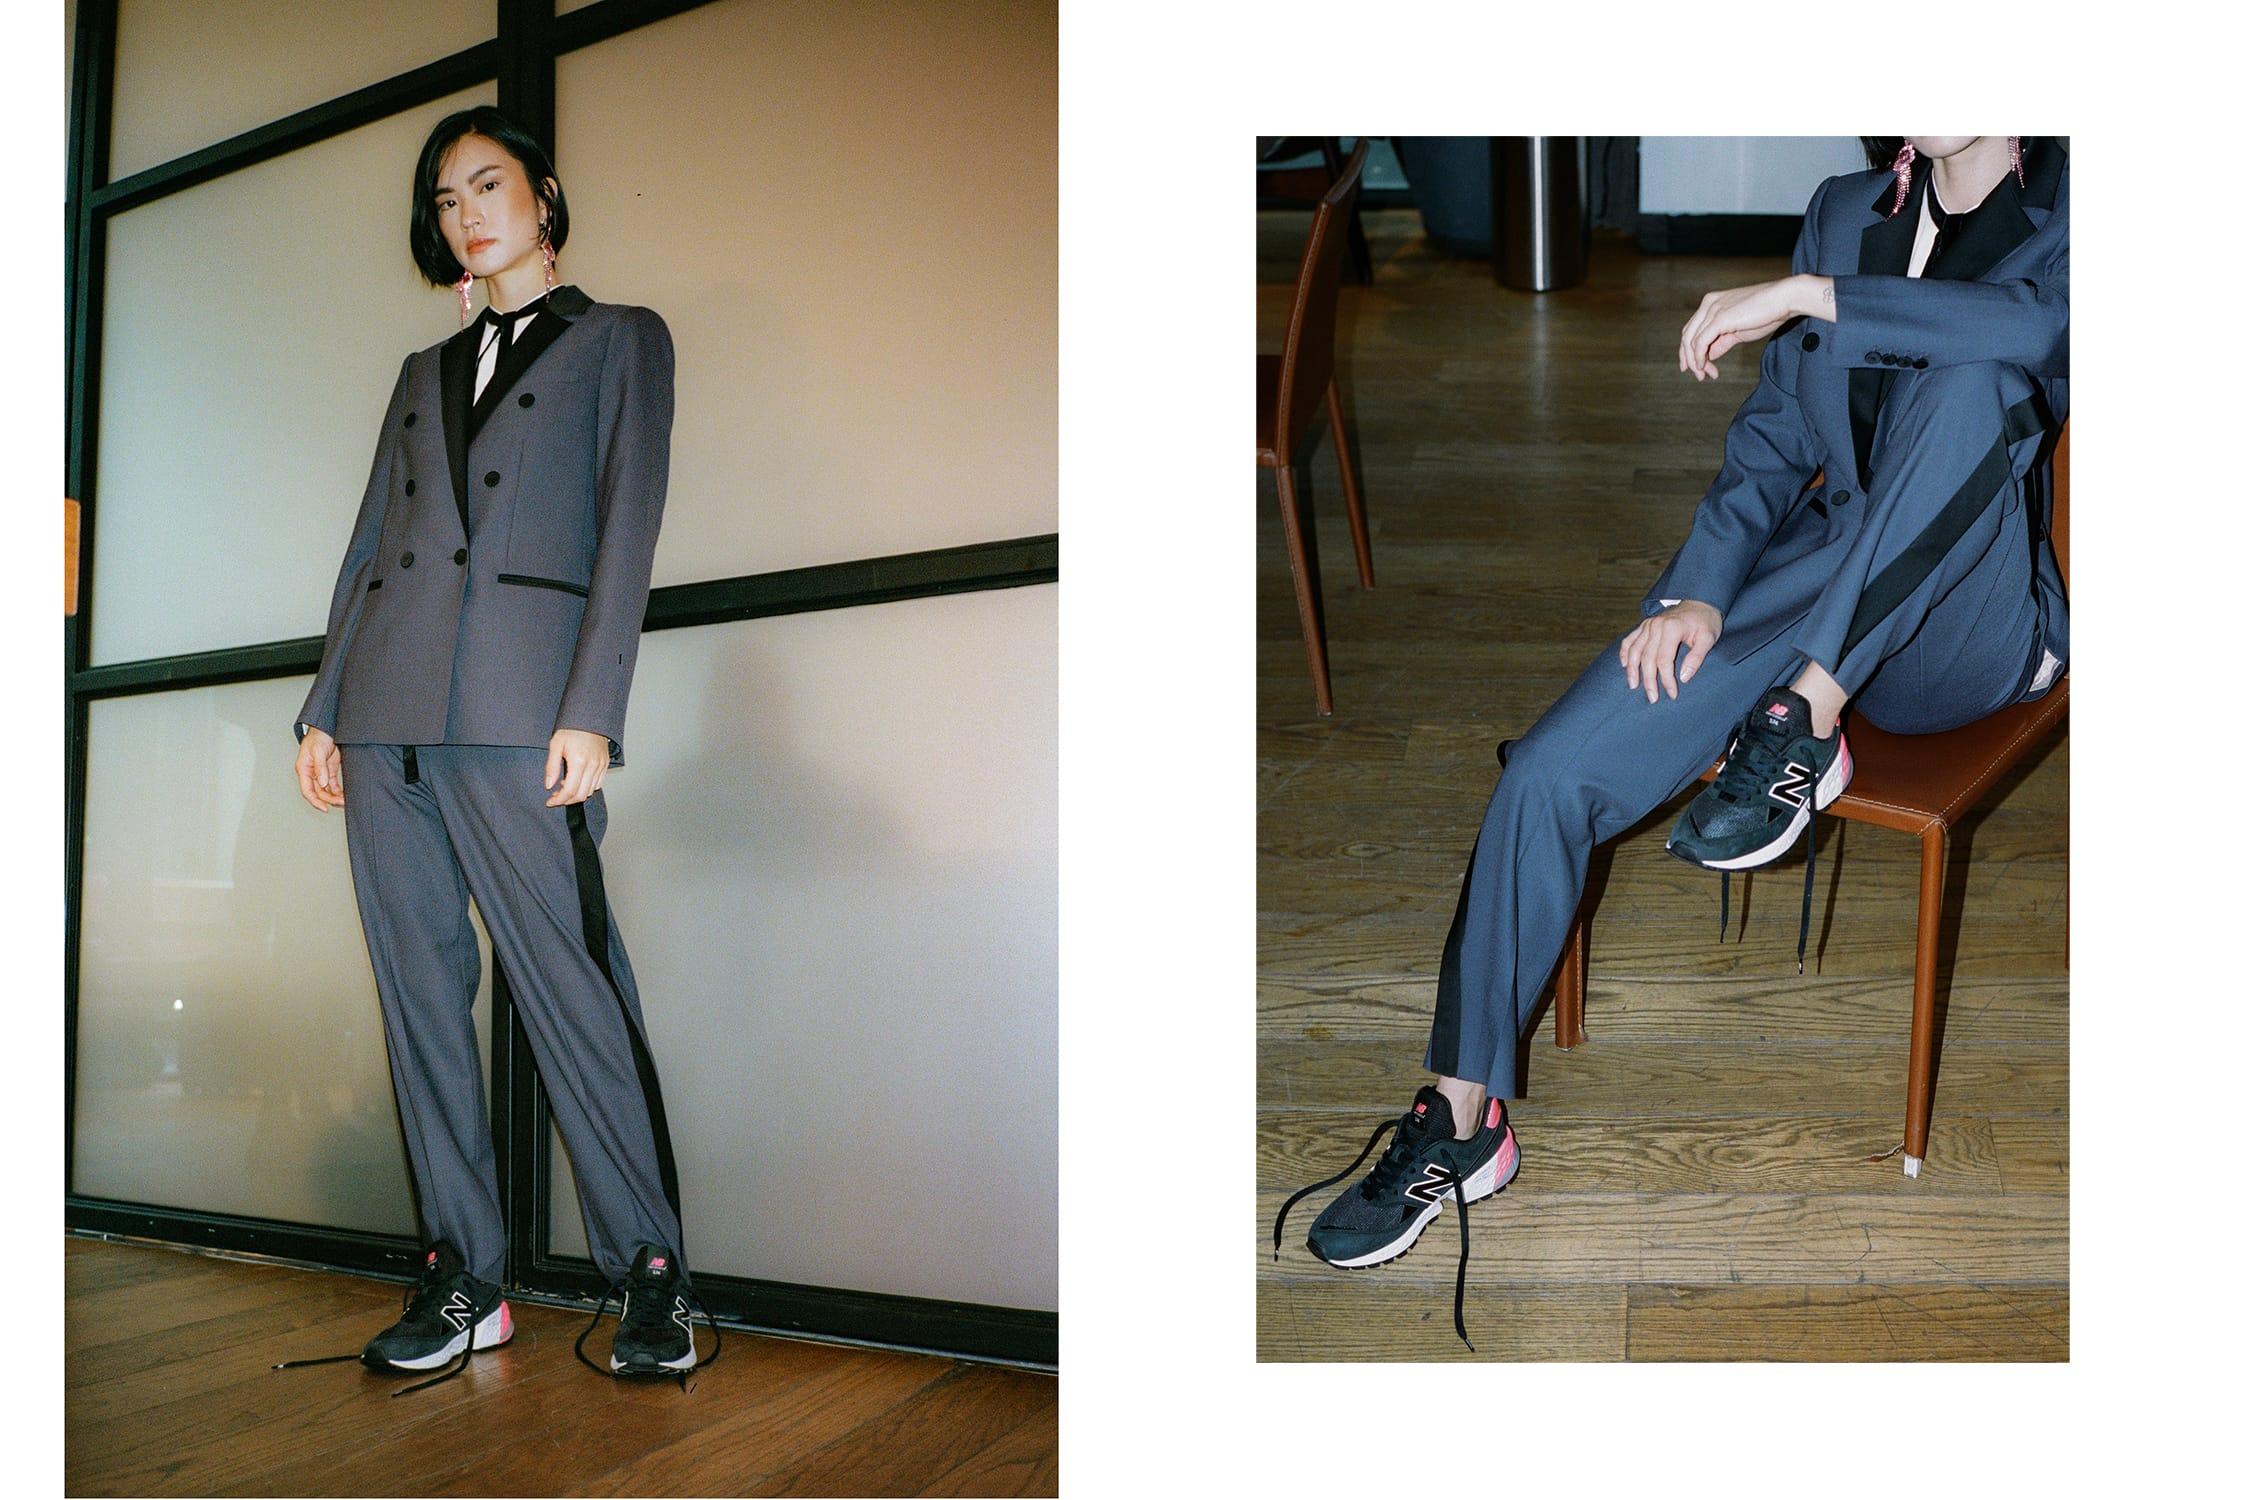 Wear Sneakers With a Women's Suit